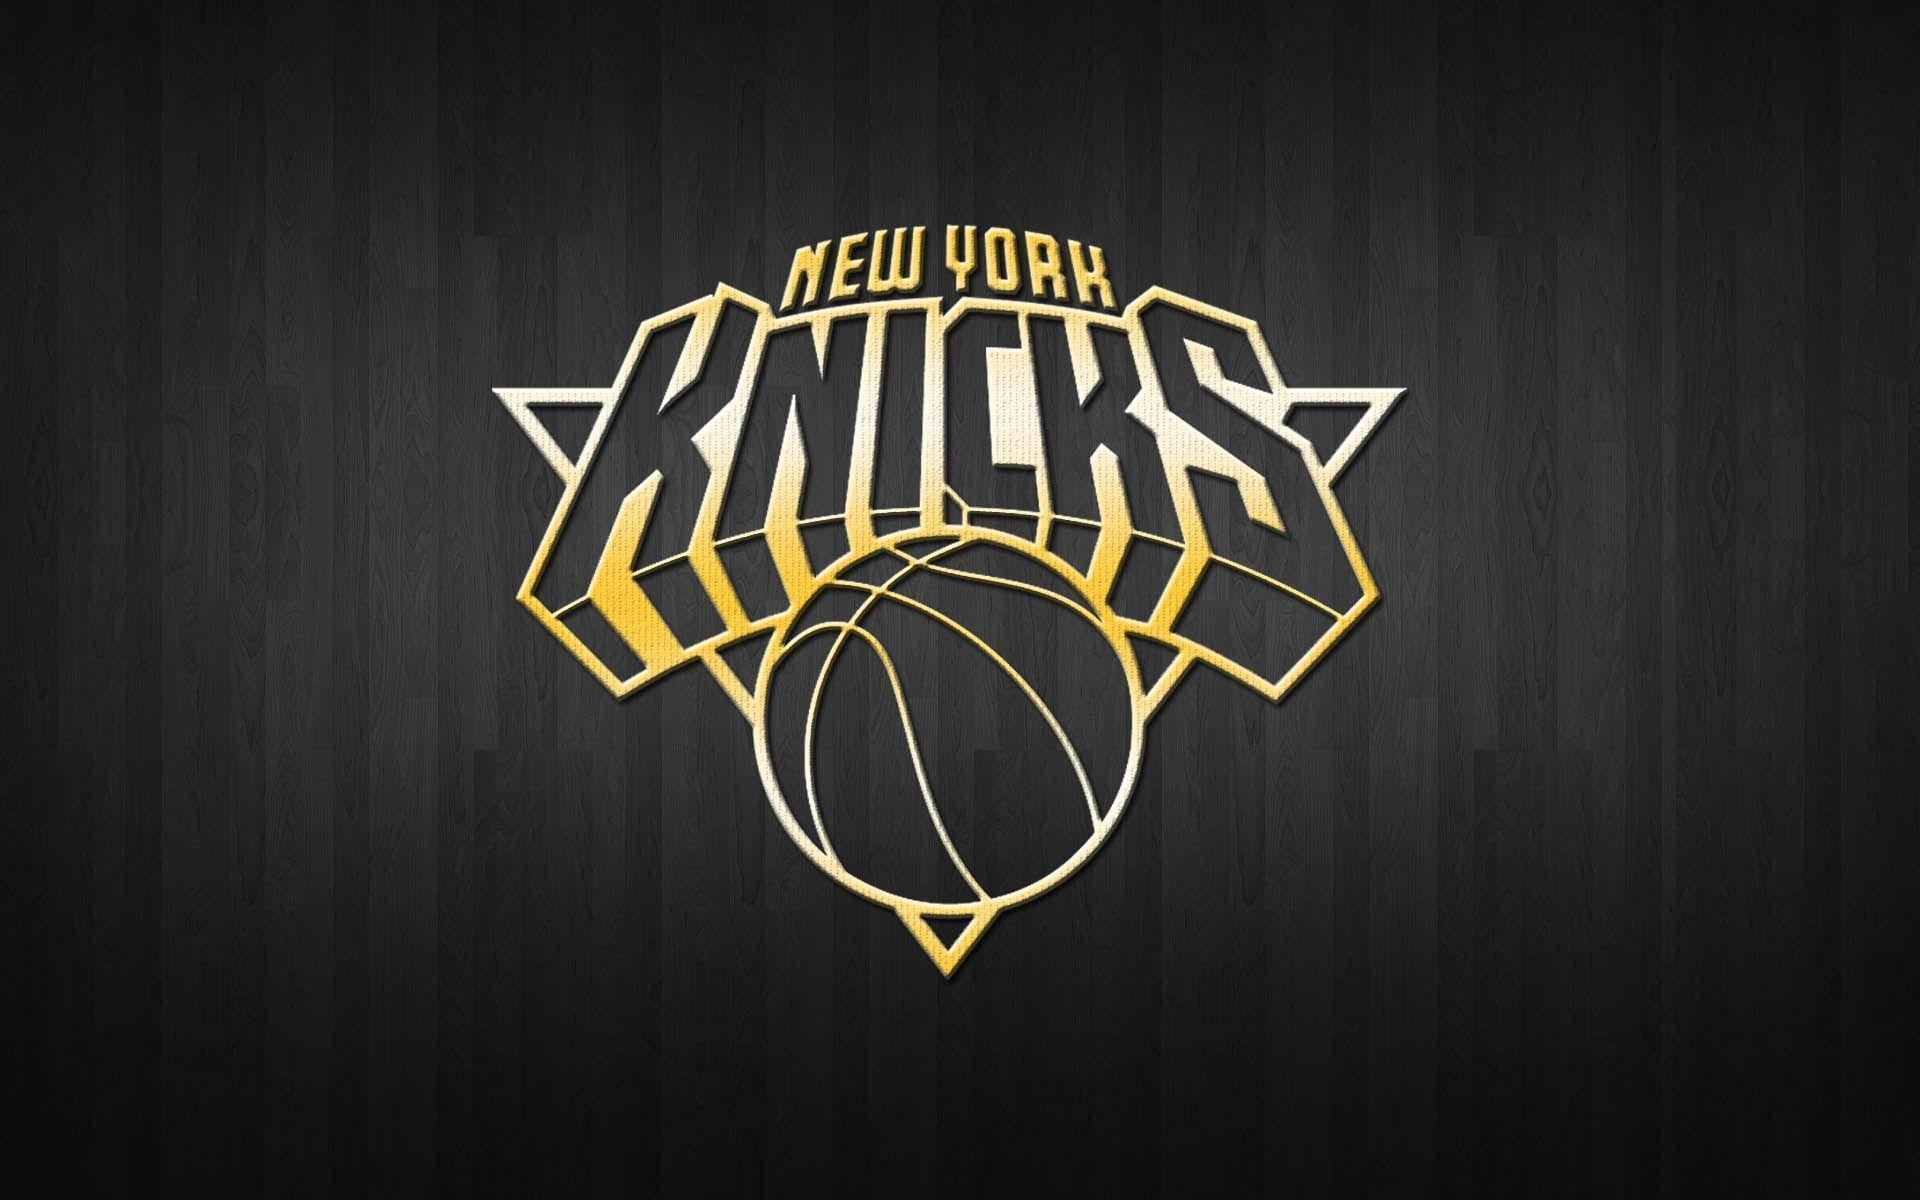 New York Knicks Wallpapers Wallpaper Cave